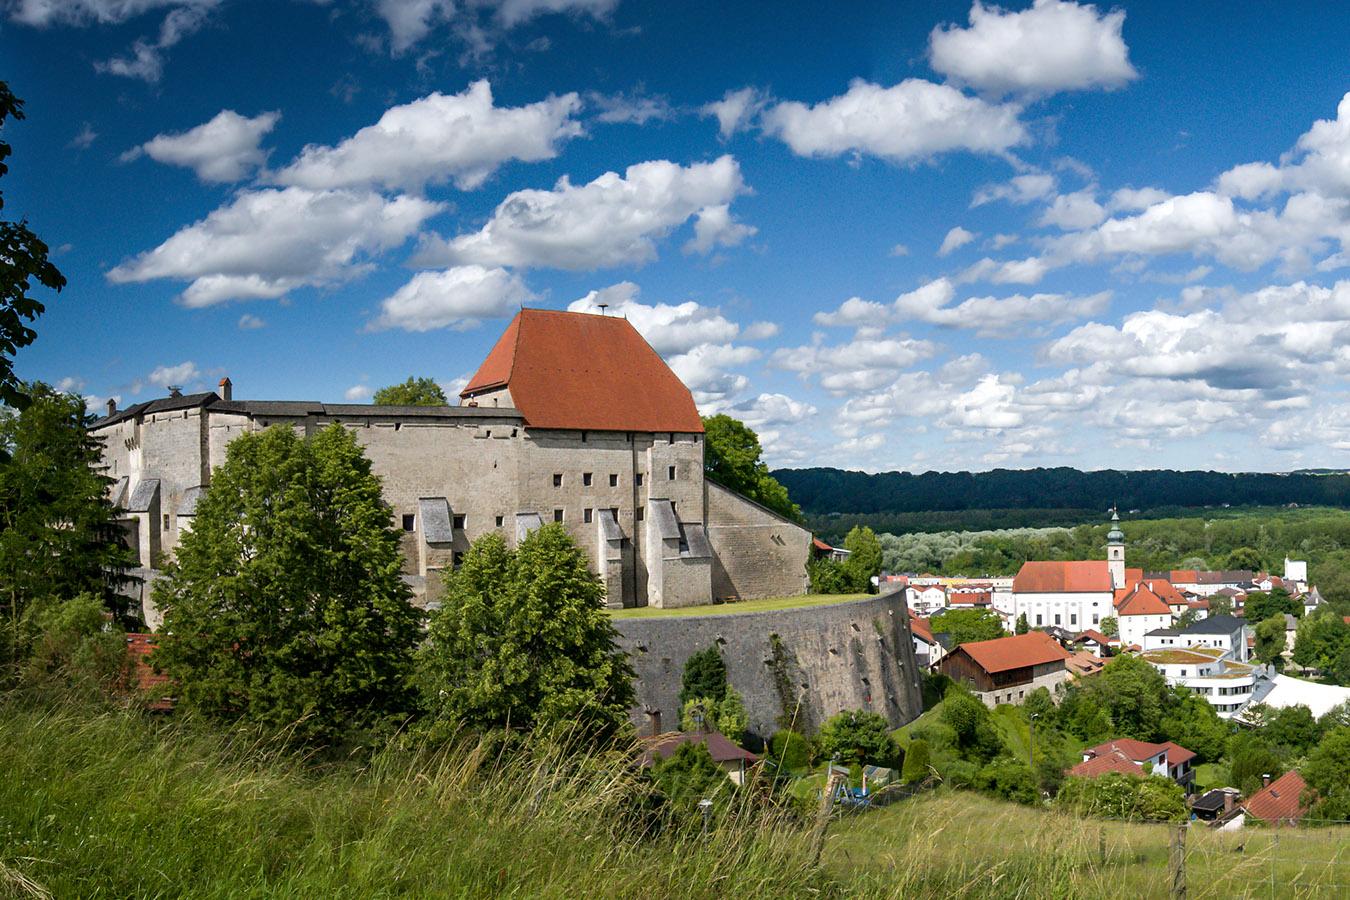 Tittmoning Burg mit Blick auf Altstadt